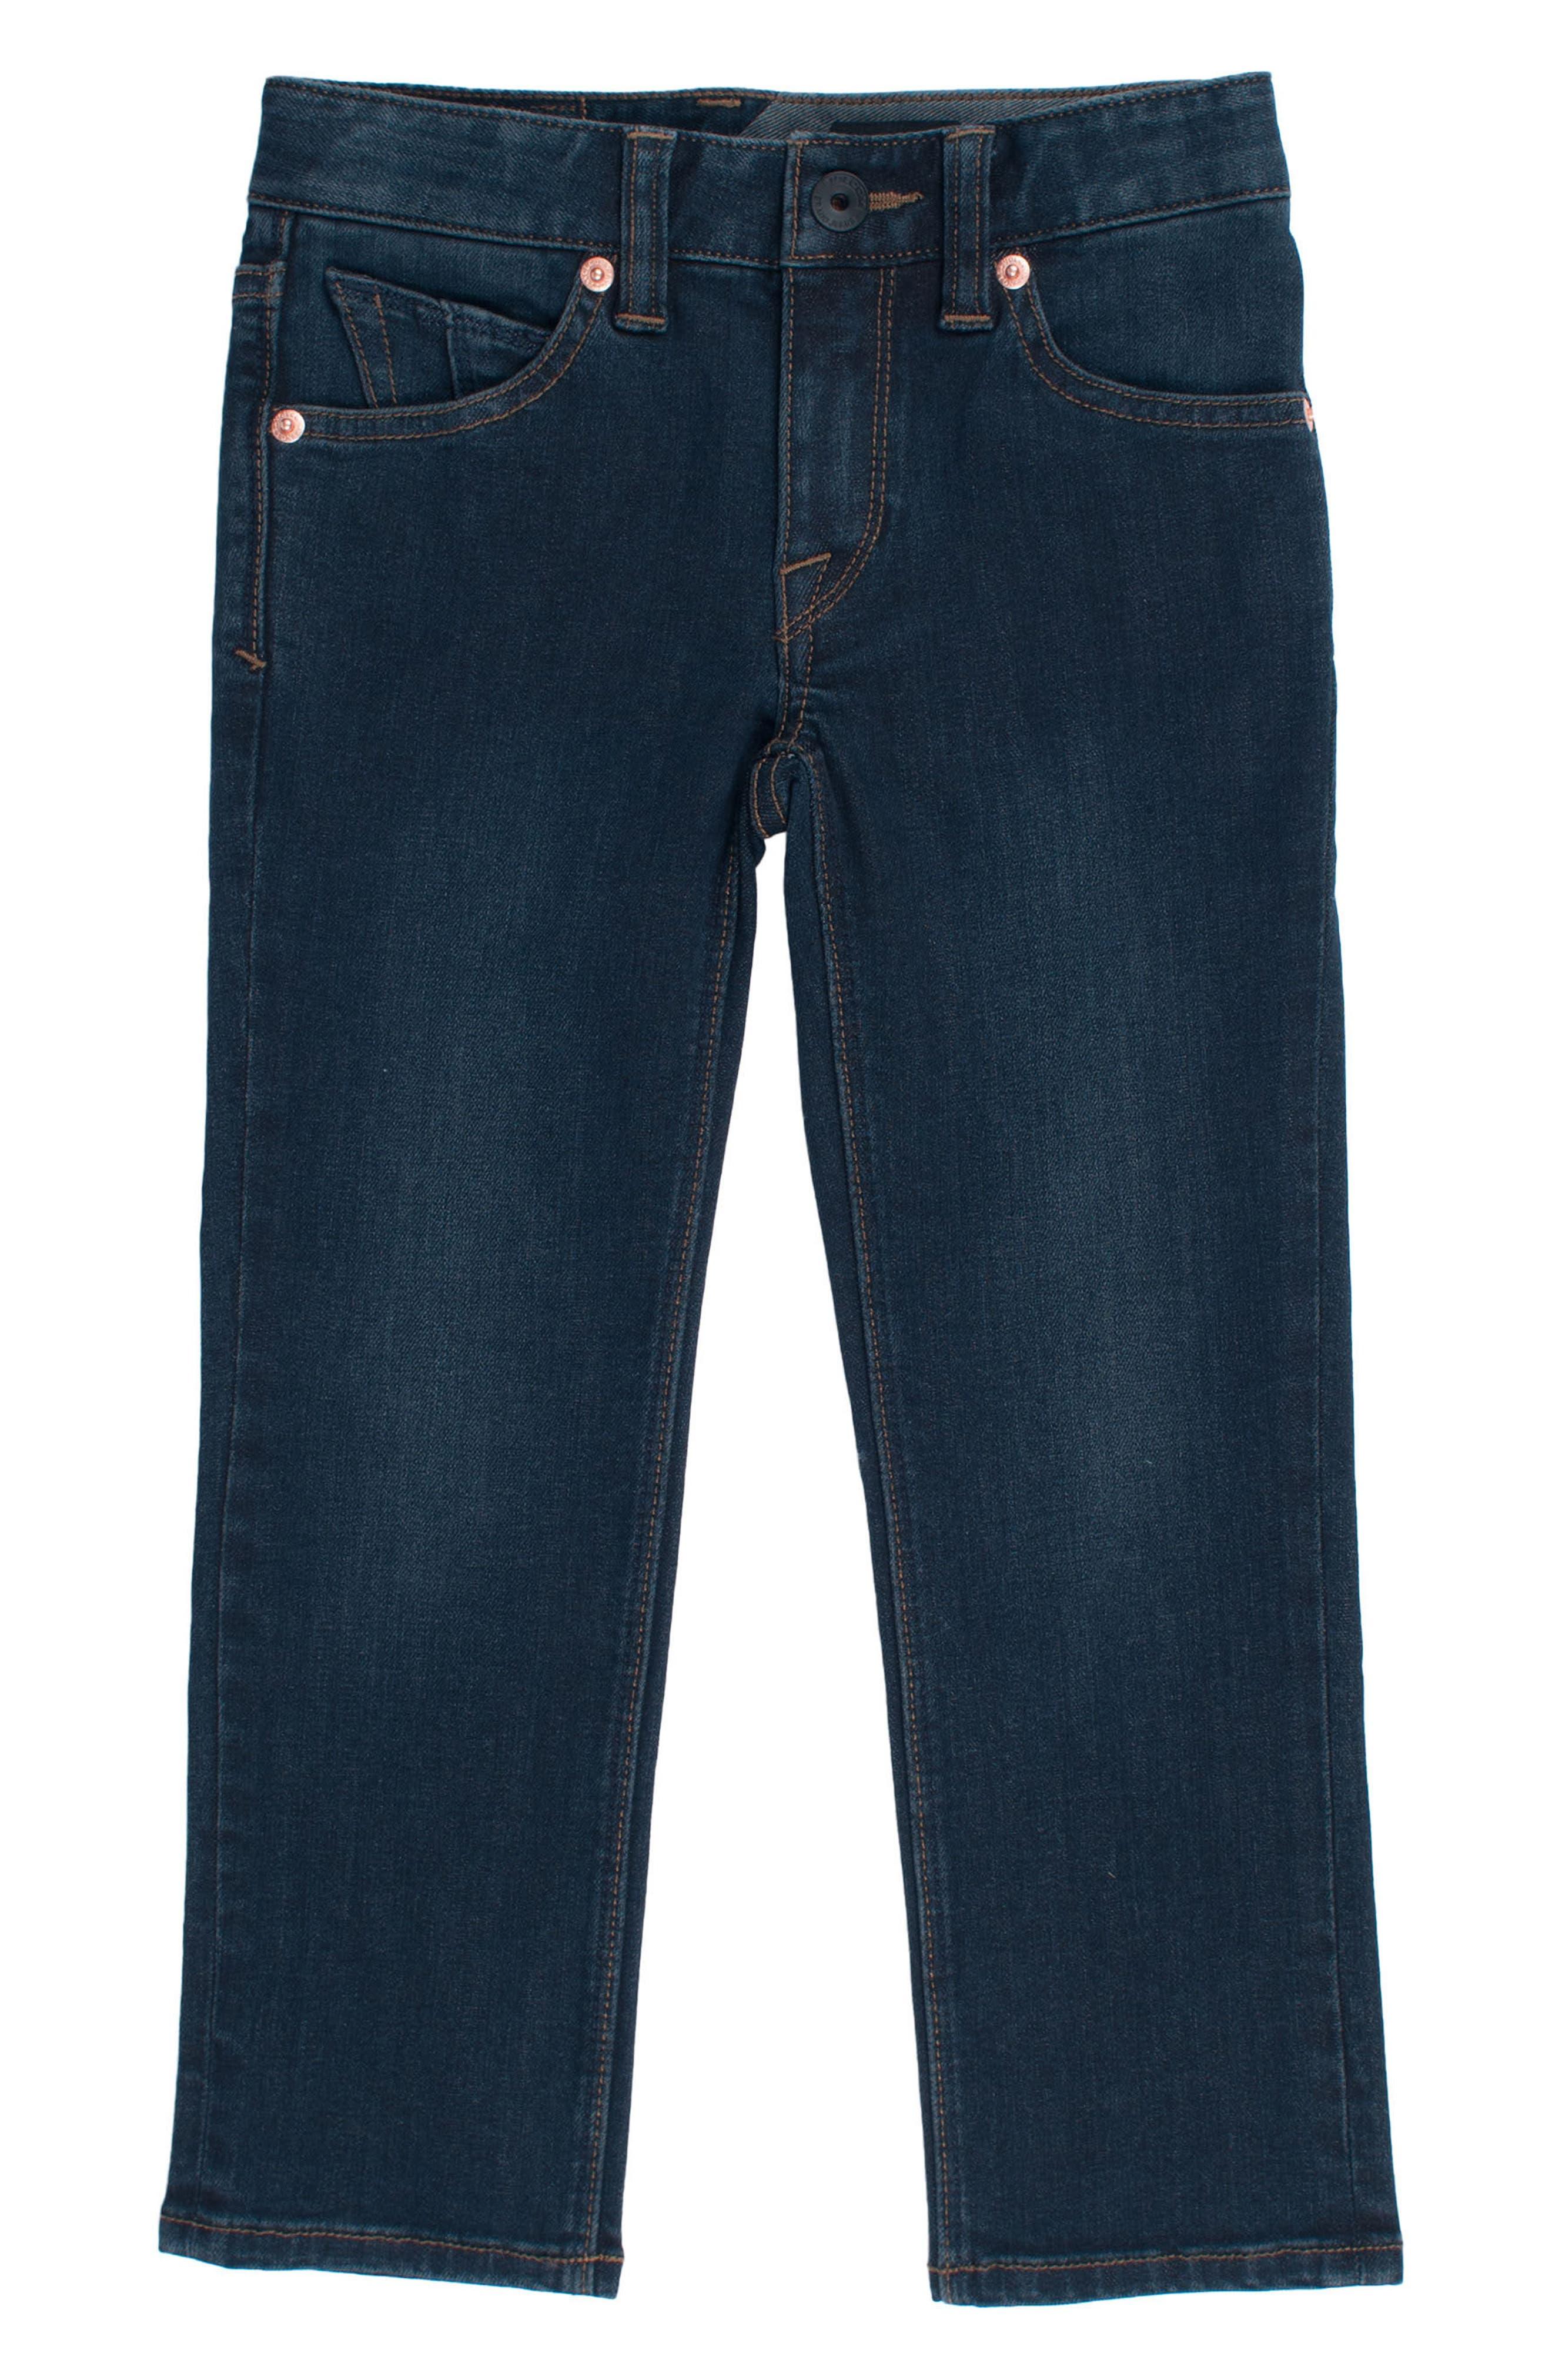 Vorta Slim Fit Jeans,                         Main,                         color, Blue Rinser